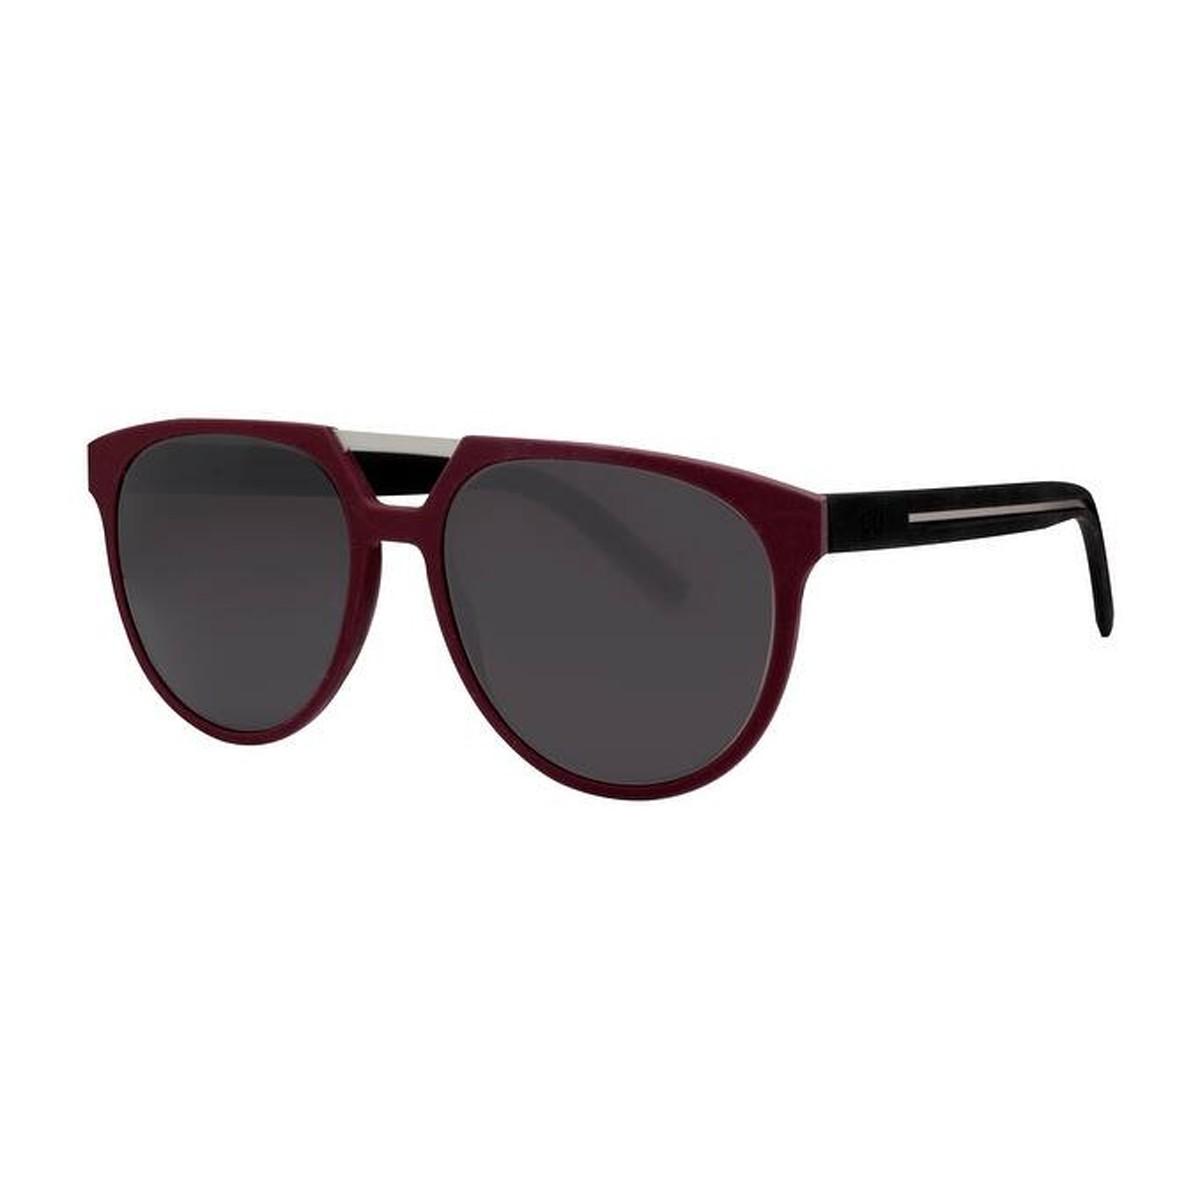 Dior Homme 0199s | Men's sunglasses